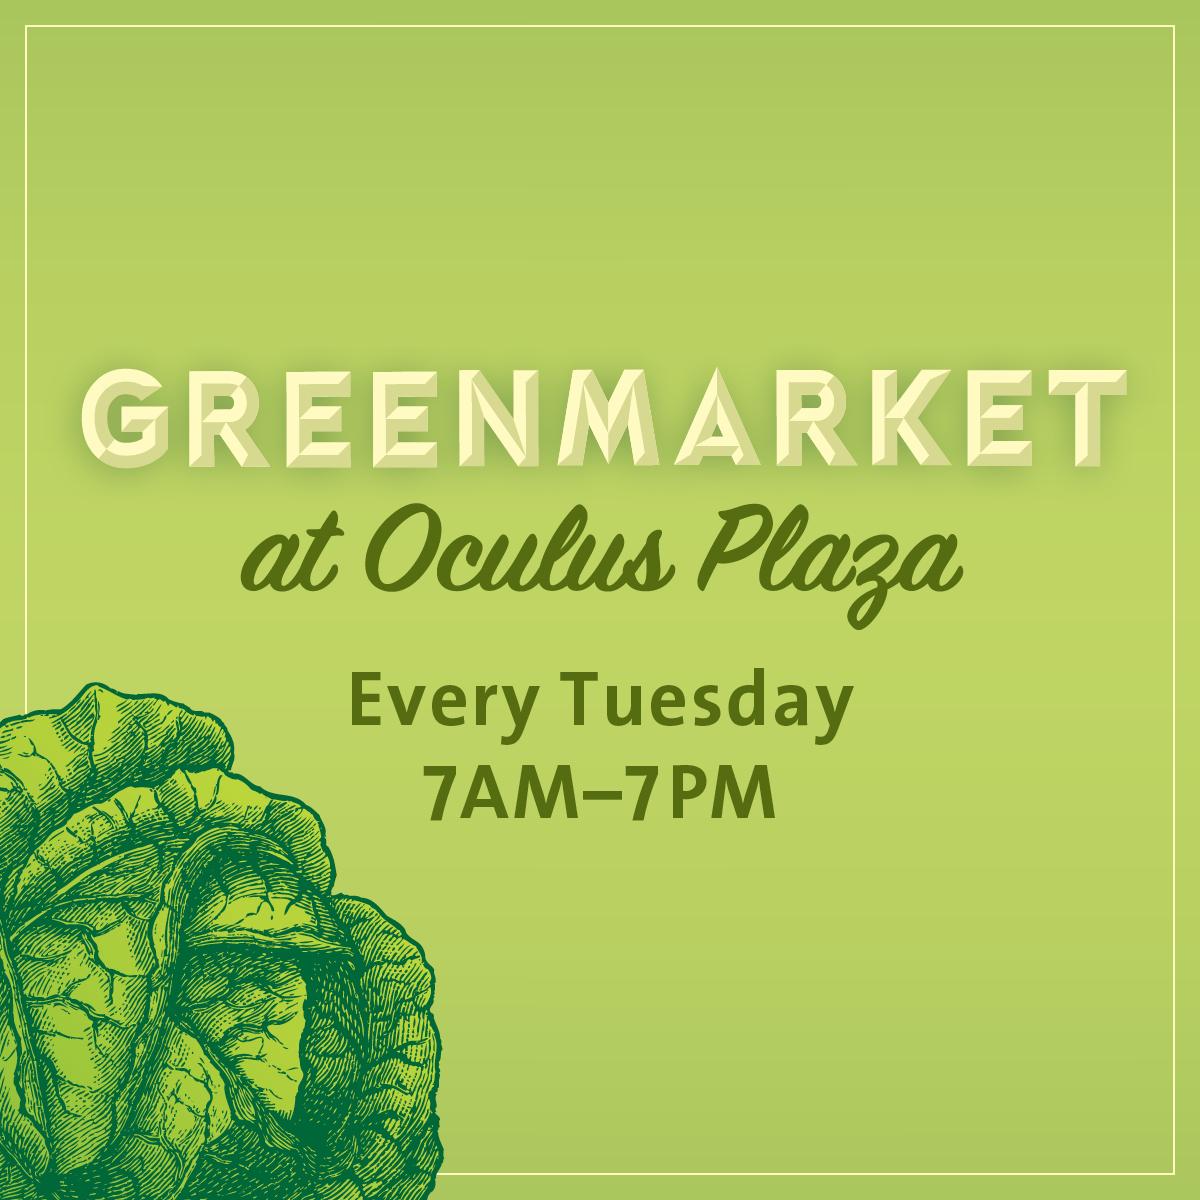 Greenmarket at Oculus Plaza